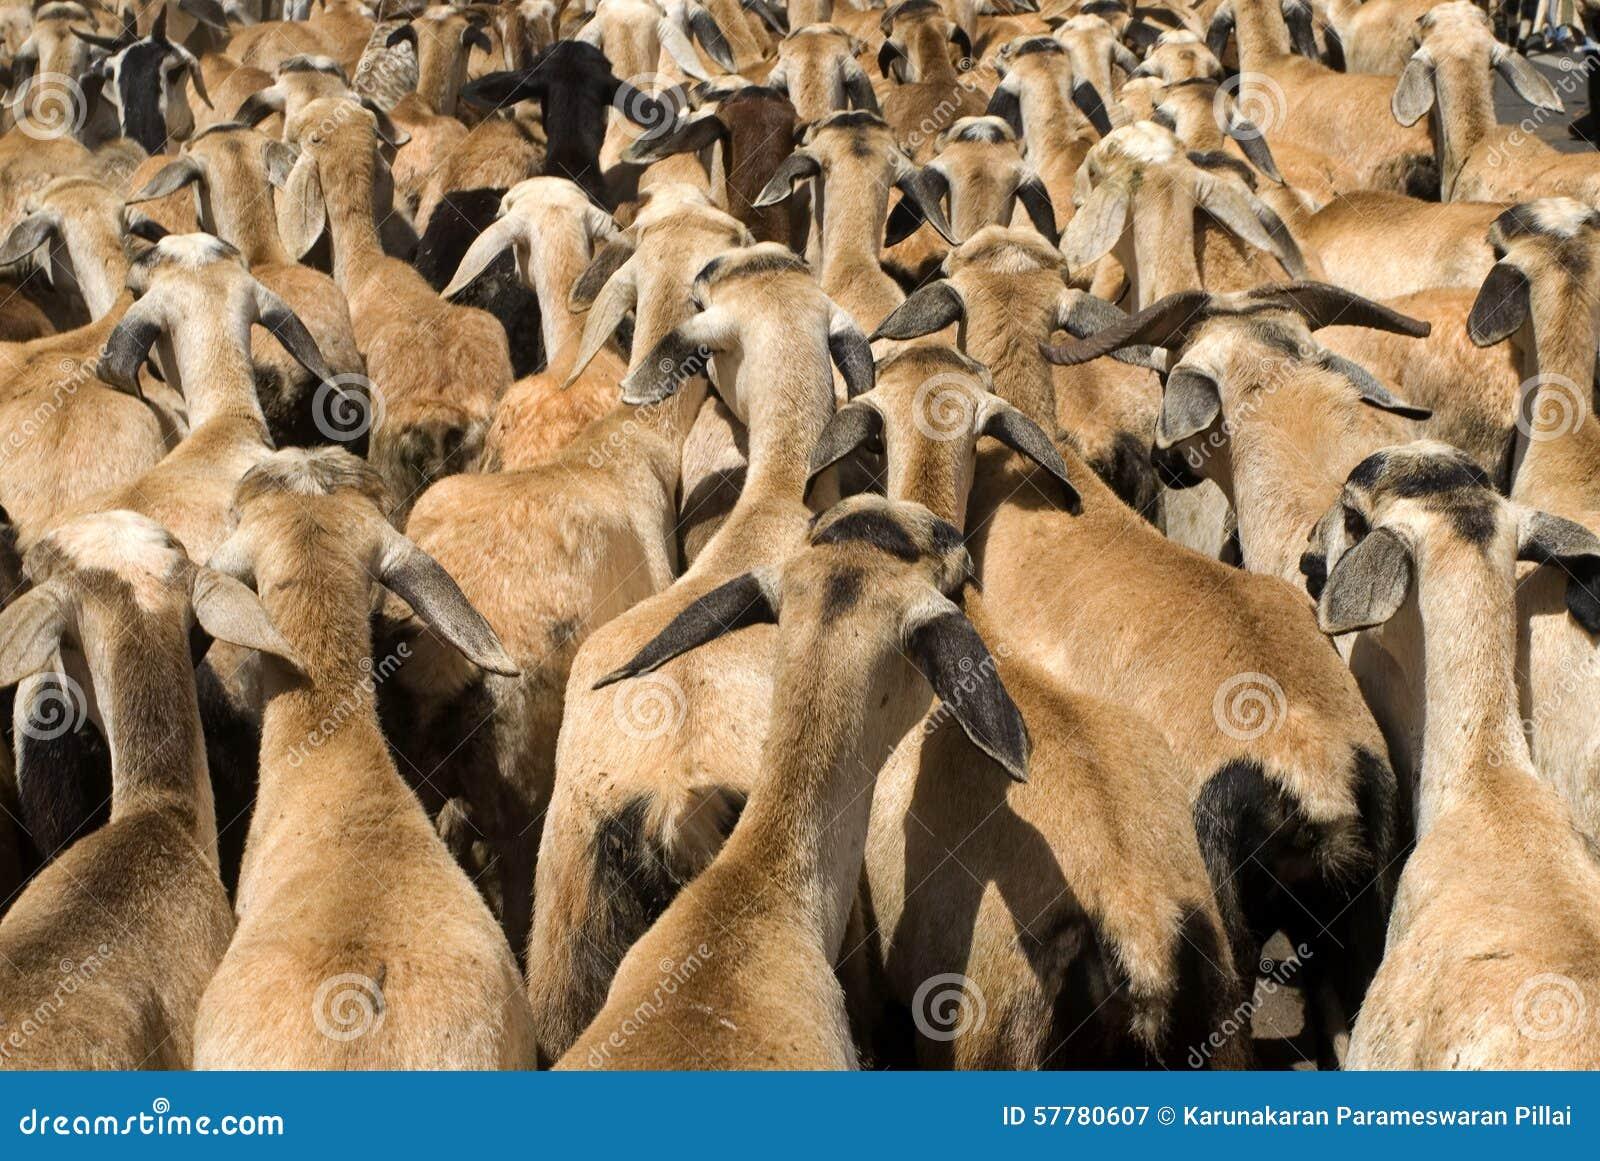 Animal Husbandry- Goats Rearing Or Goat Farming Stock Image